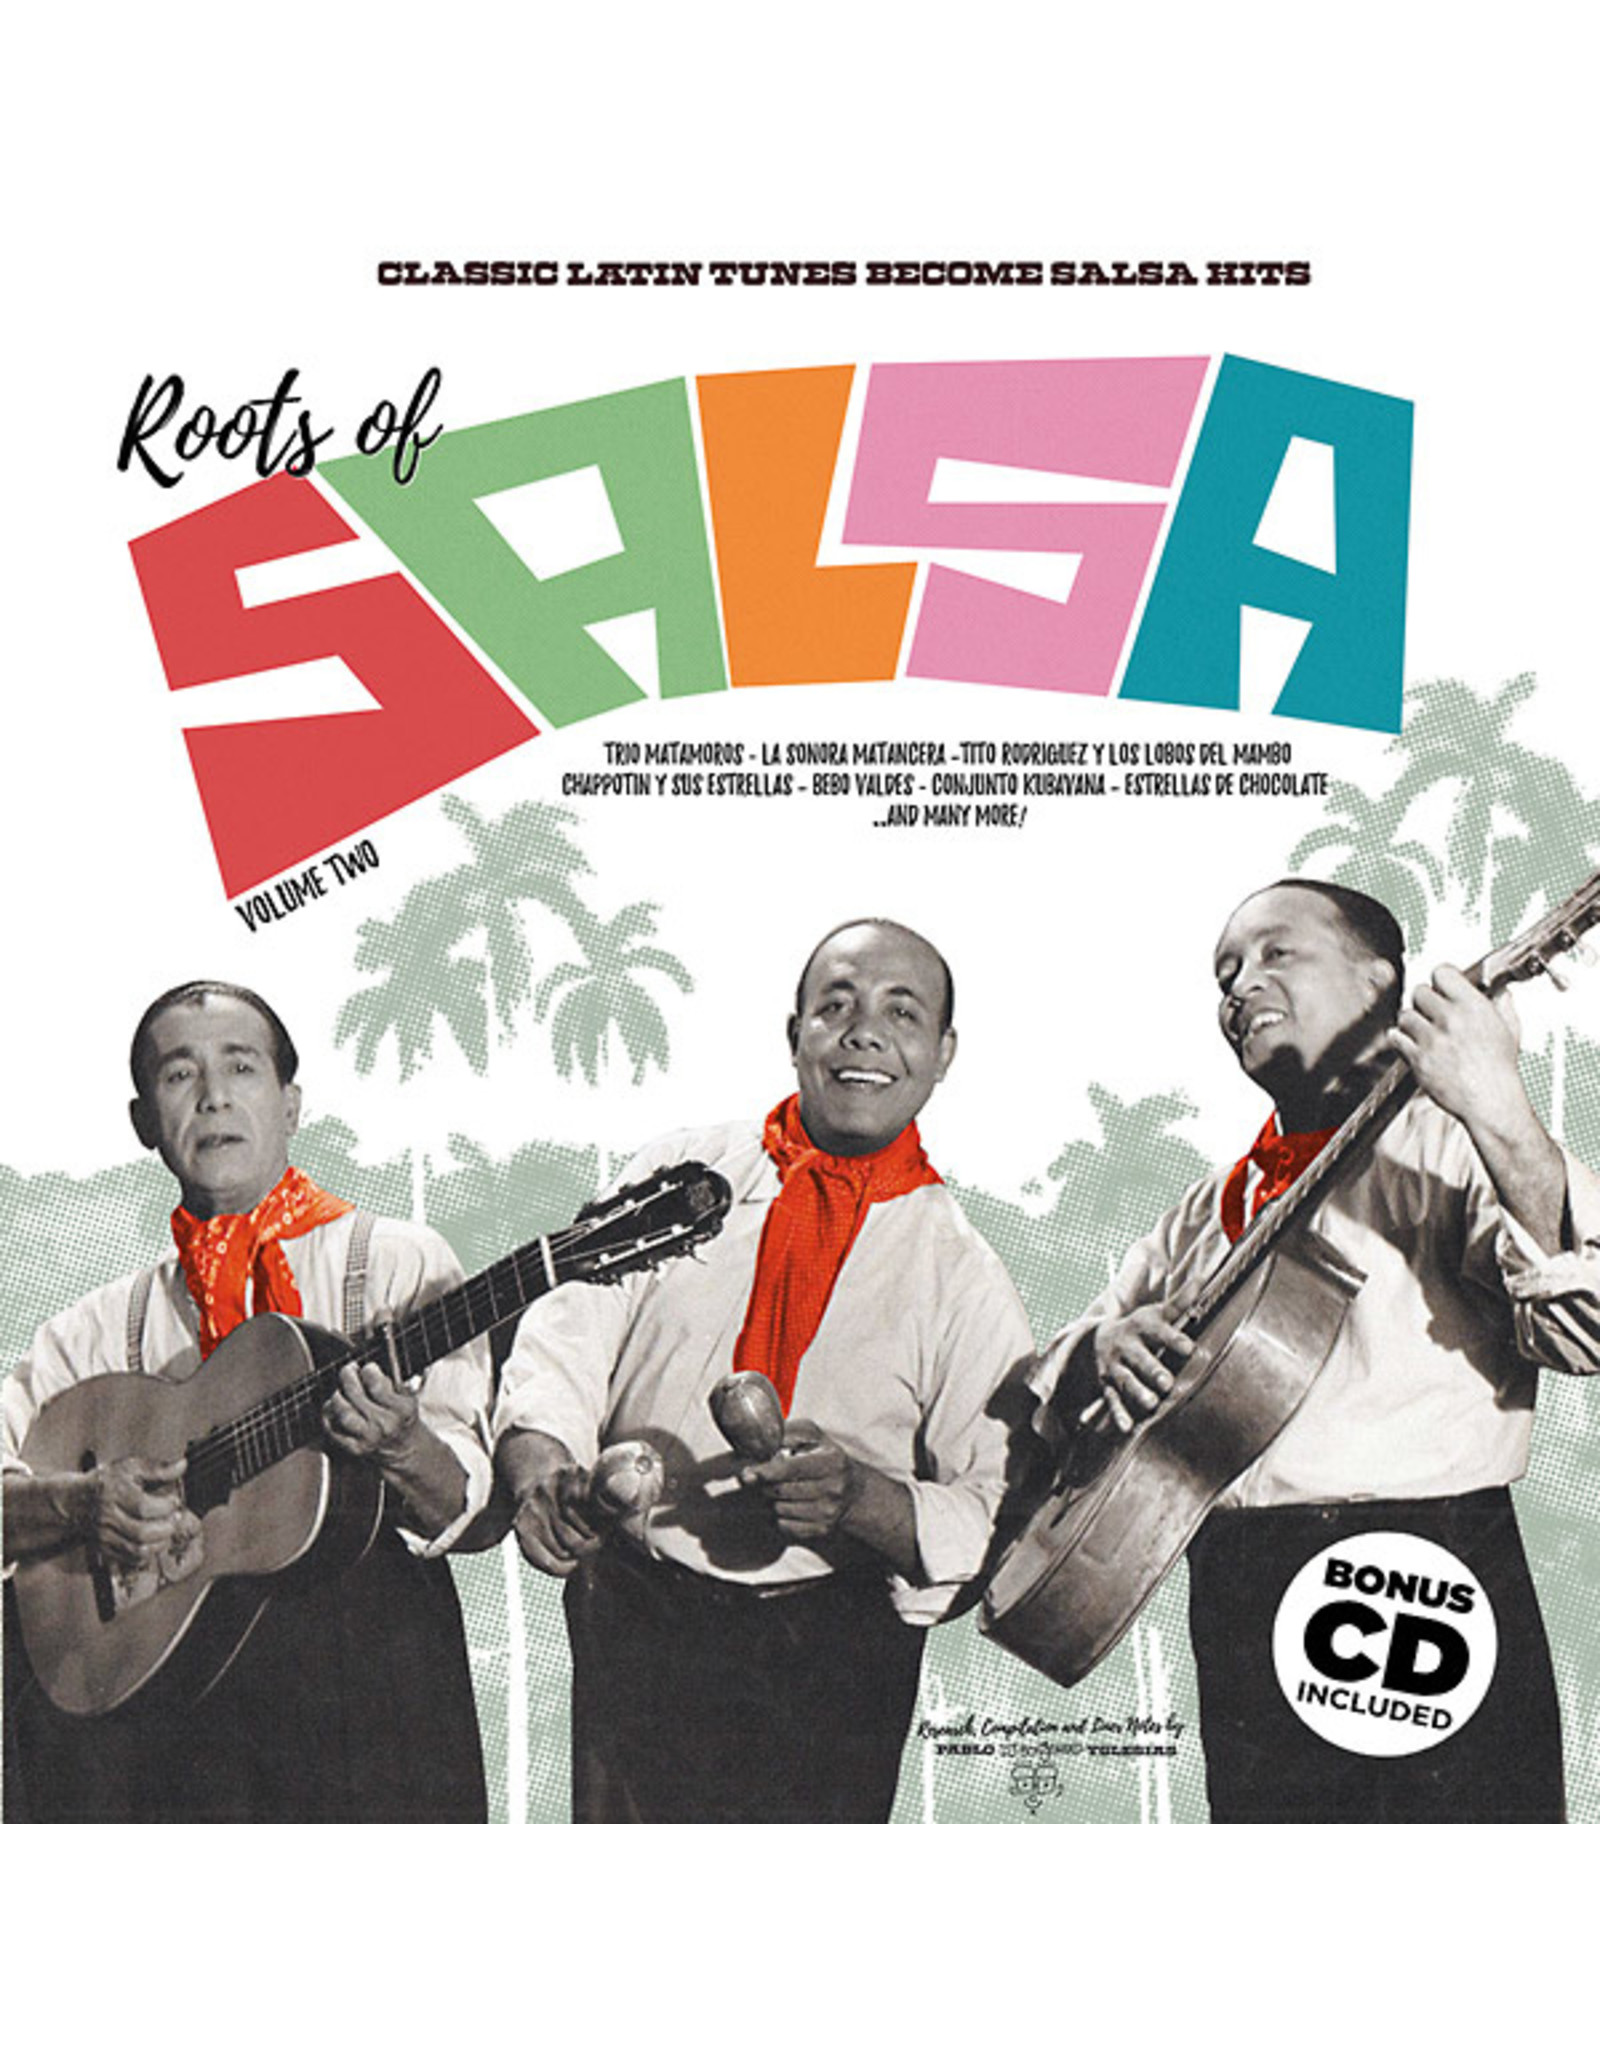 New Vinyl Various - Roots Of Salsa Vol. 2: Classic Latin Tunes Become Salsa Hits LP+CD